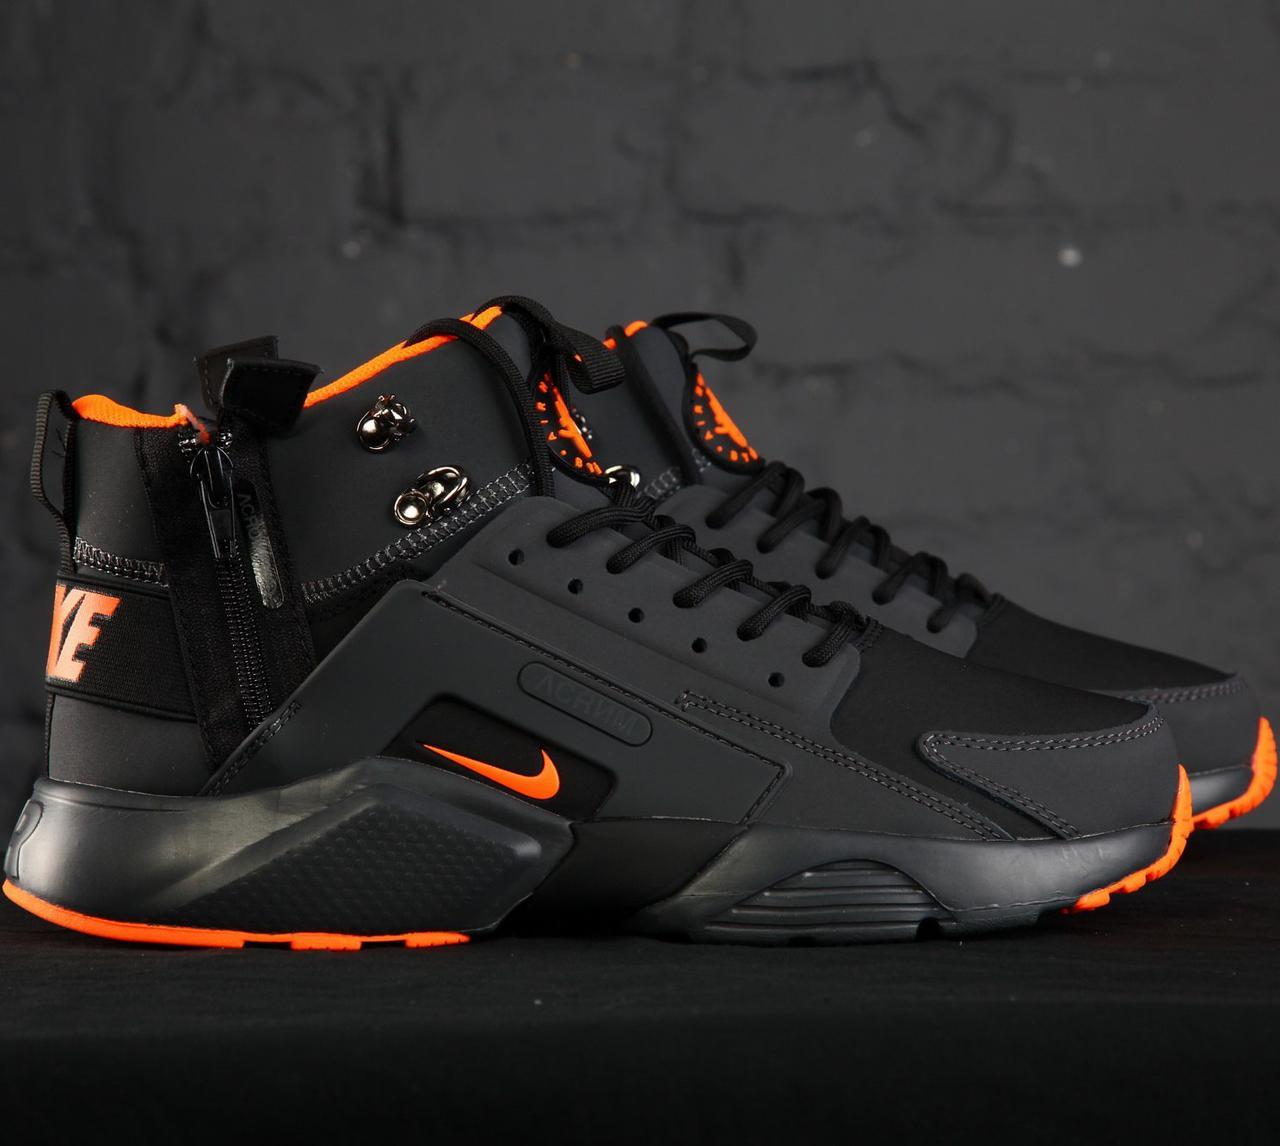 166d8ec0 Мужские кроссовки Nike Huarache Acronym Concept Black/Orange -  Интернет-магазин обуви Bootlords в